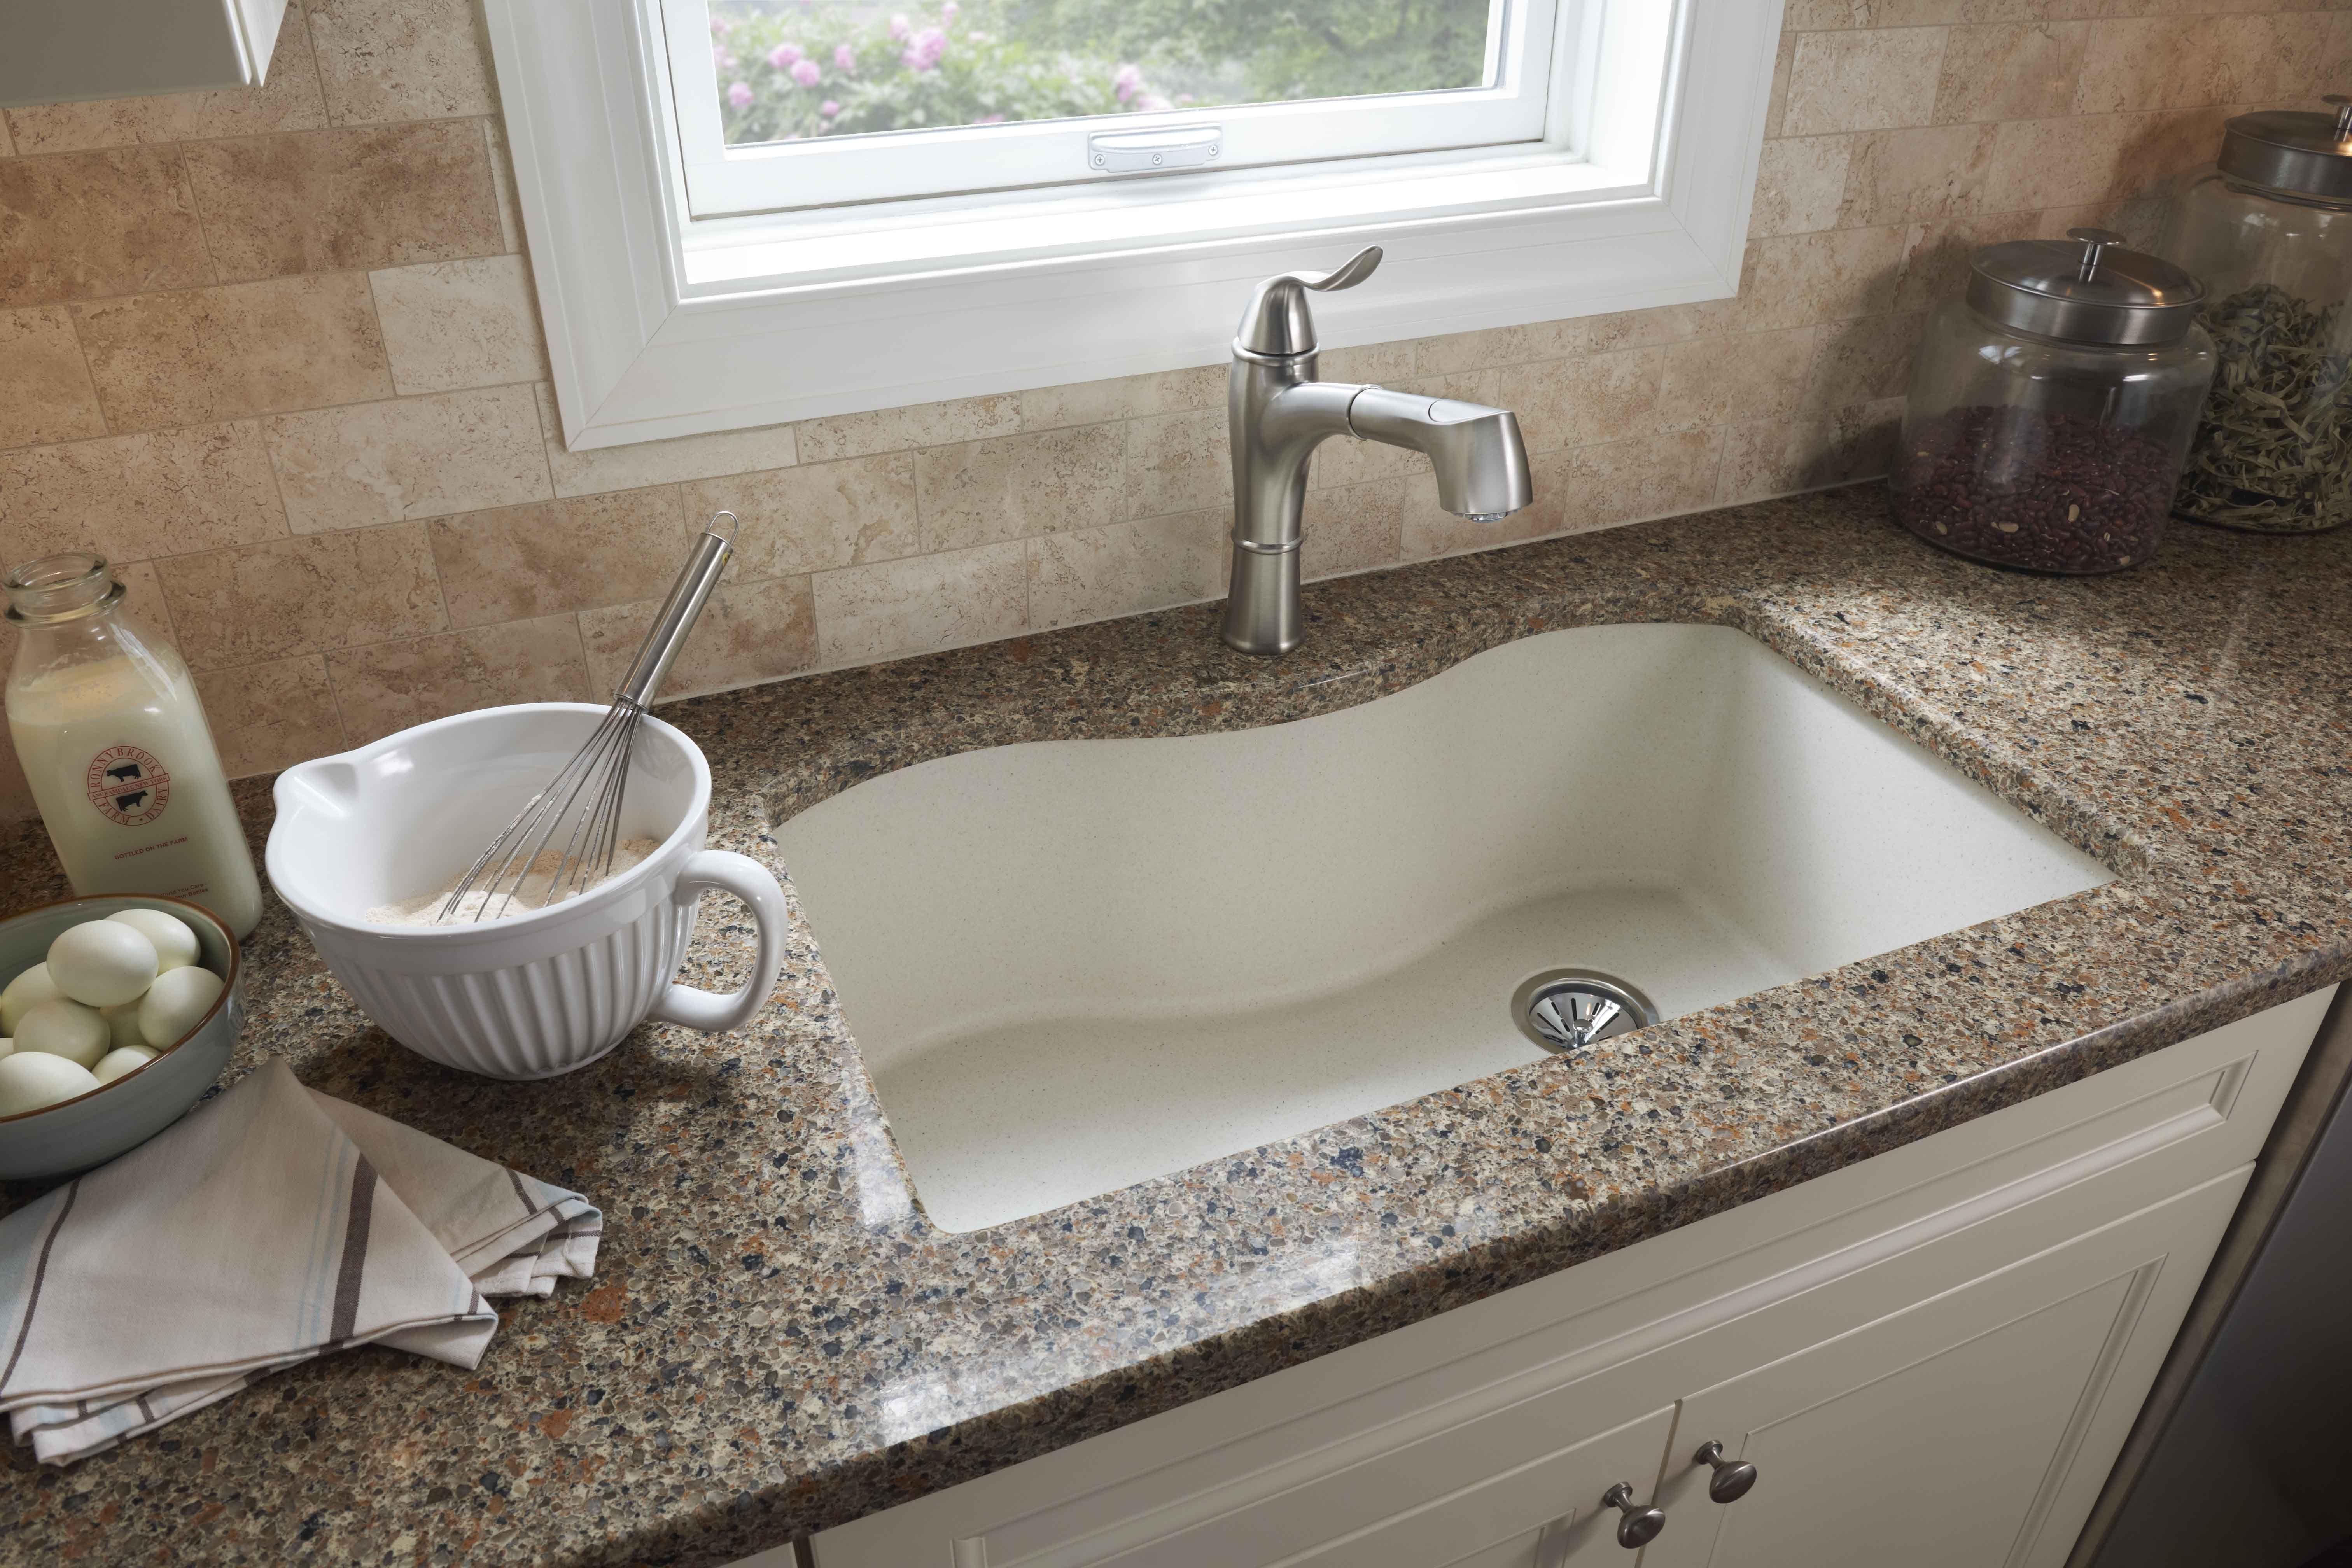 Quartz Classic 33 X 20 X 9 1 2 Single Bowl Undermount Sink